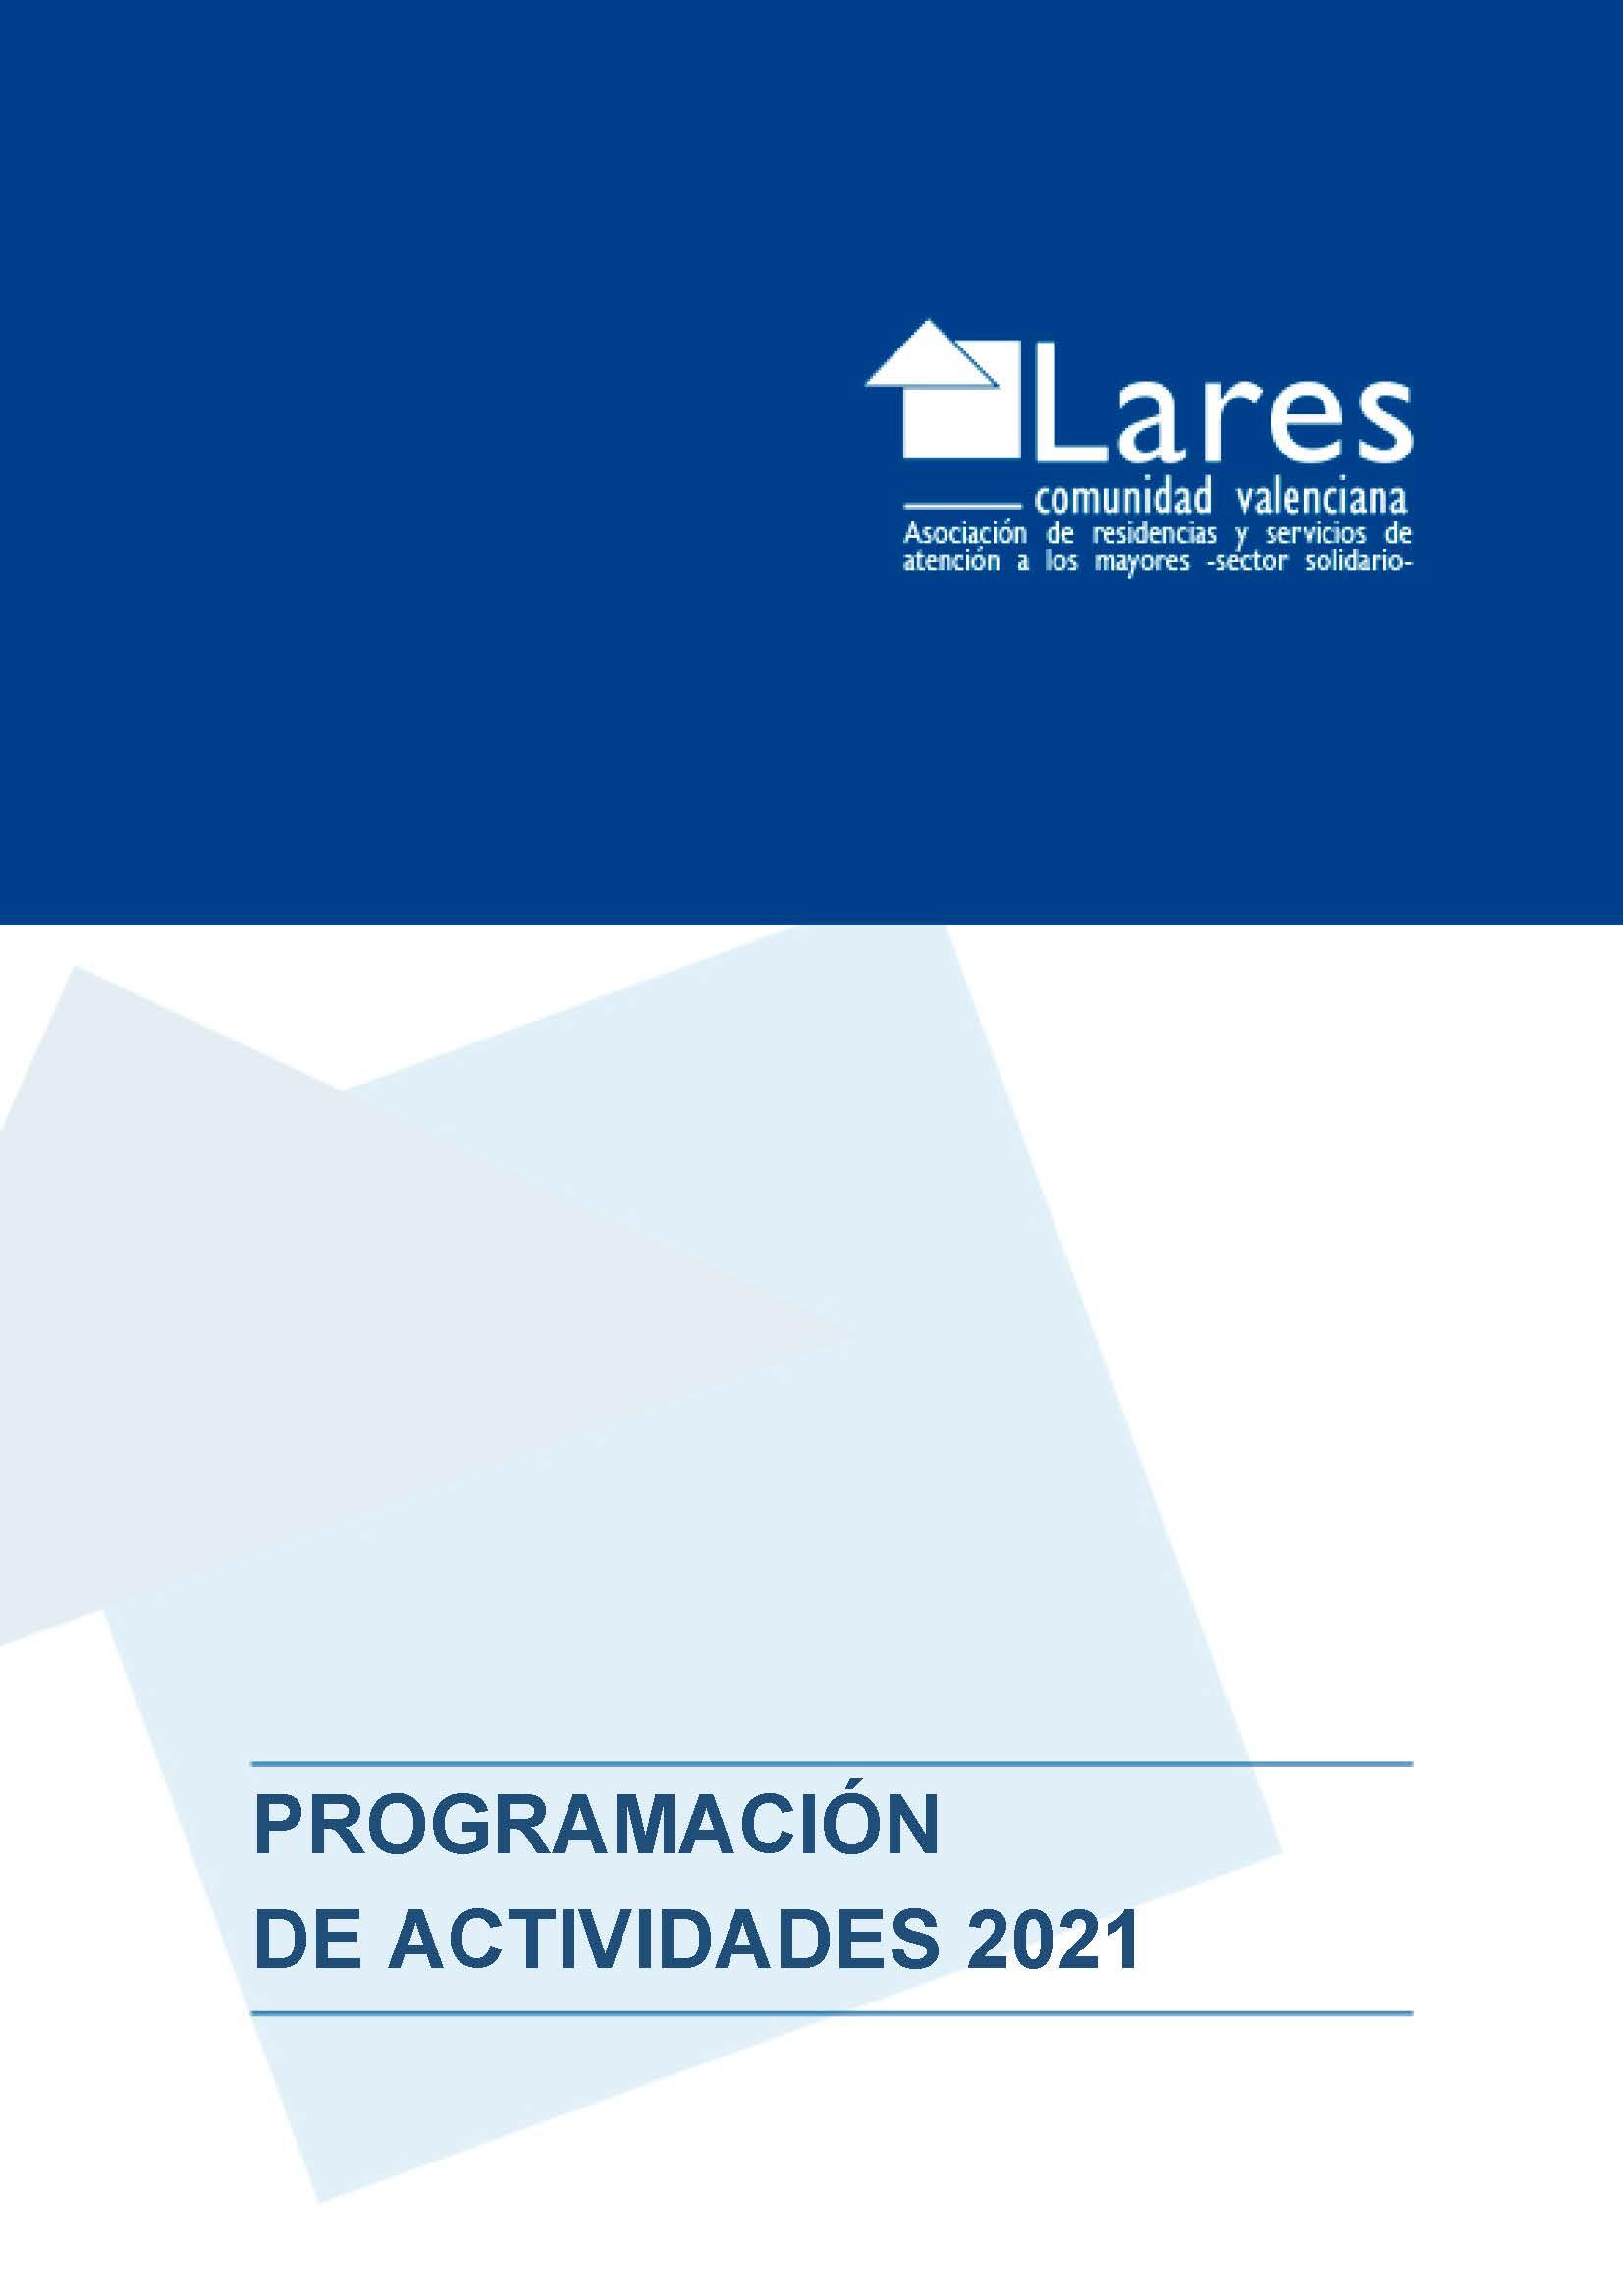 0. PORTADA PROGRAMACION LARES 2021 - Ley de transparencia